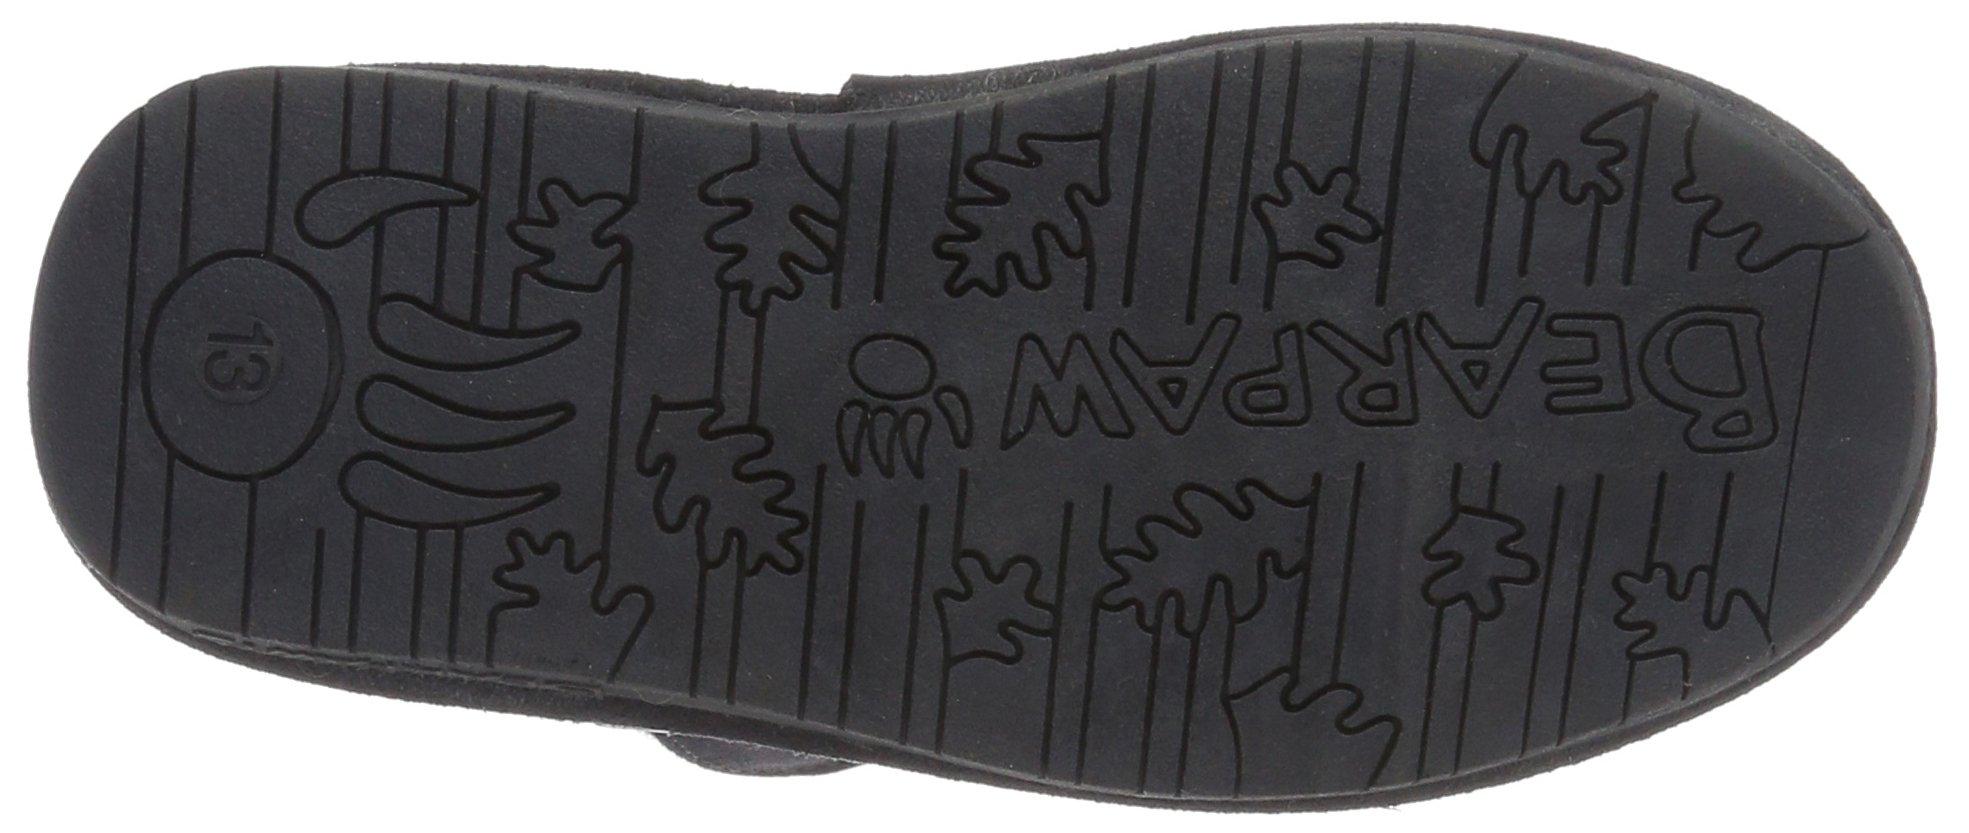 Bearpaw Abigail Charcoal Unisex Kids Shearling Boot Size 1M by BEARPAW (Image #3)